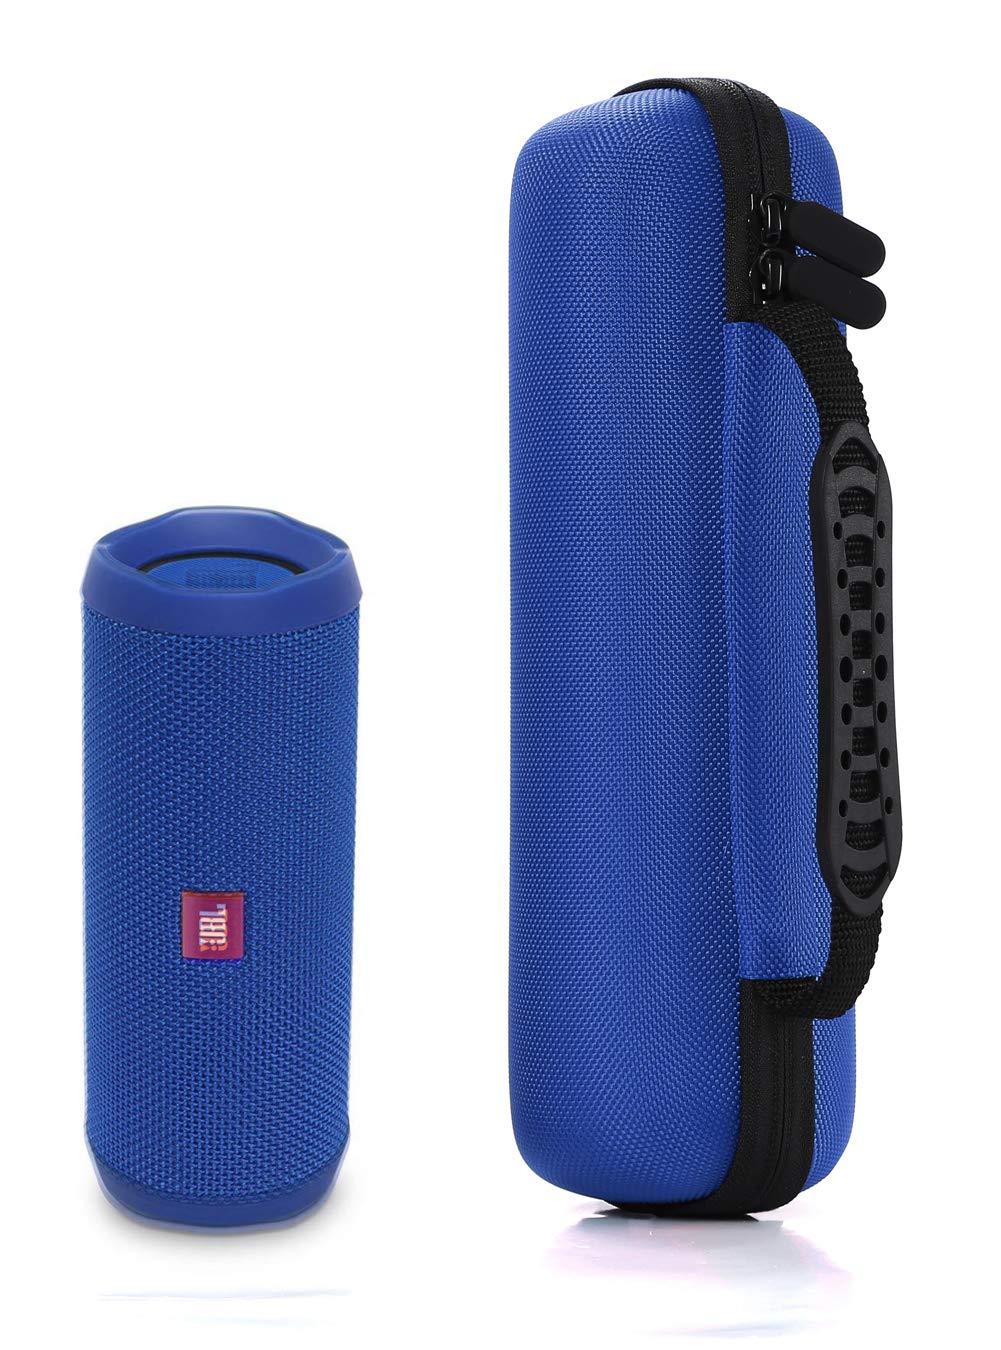 JBL Flip 3 Altavoz Bluetooth port/átil Funda de Transporte R/ígido para JBL Flip 4 Compatible con Cable USB y Cargador de pared-Negro